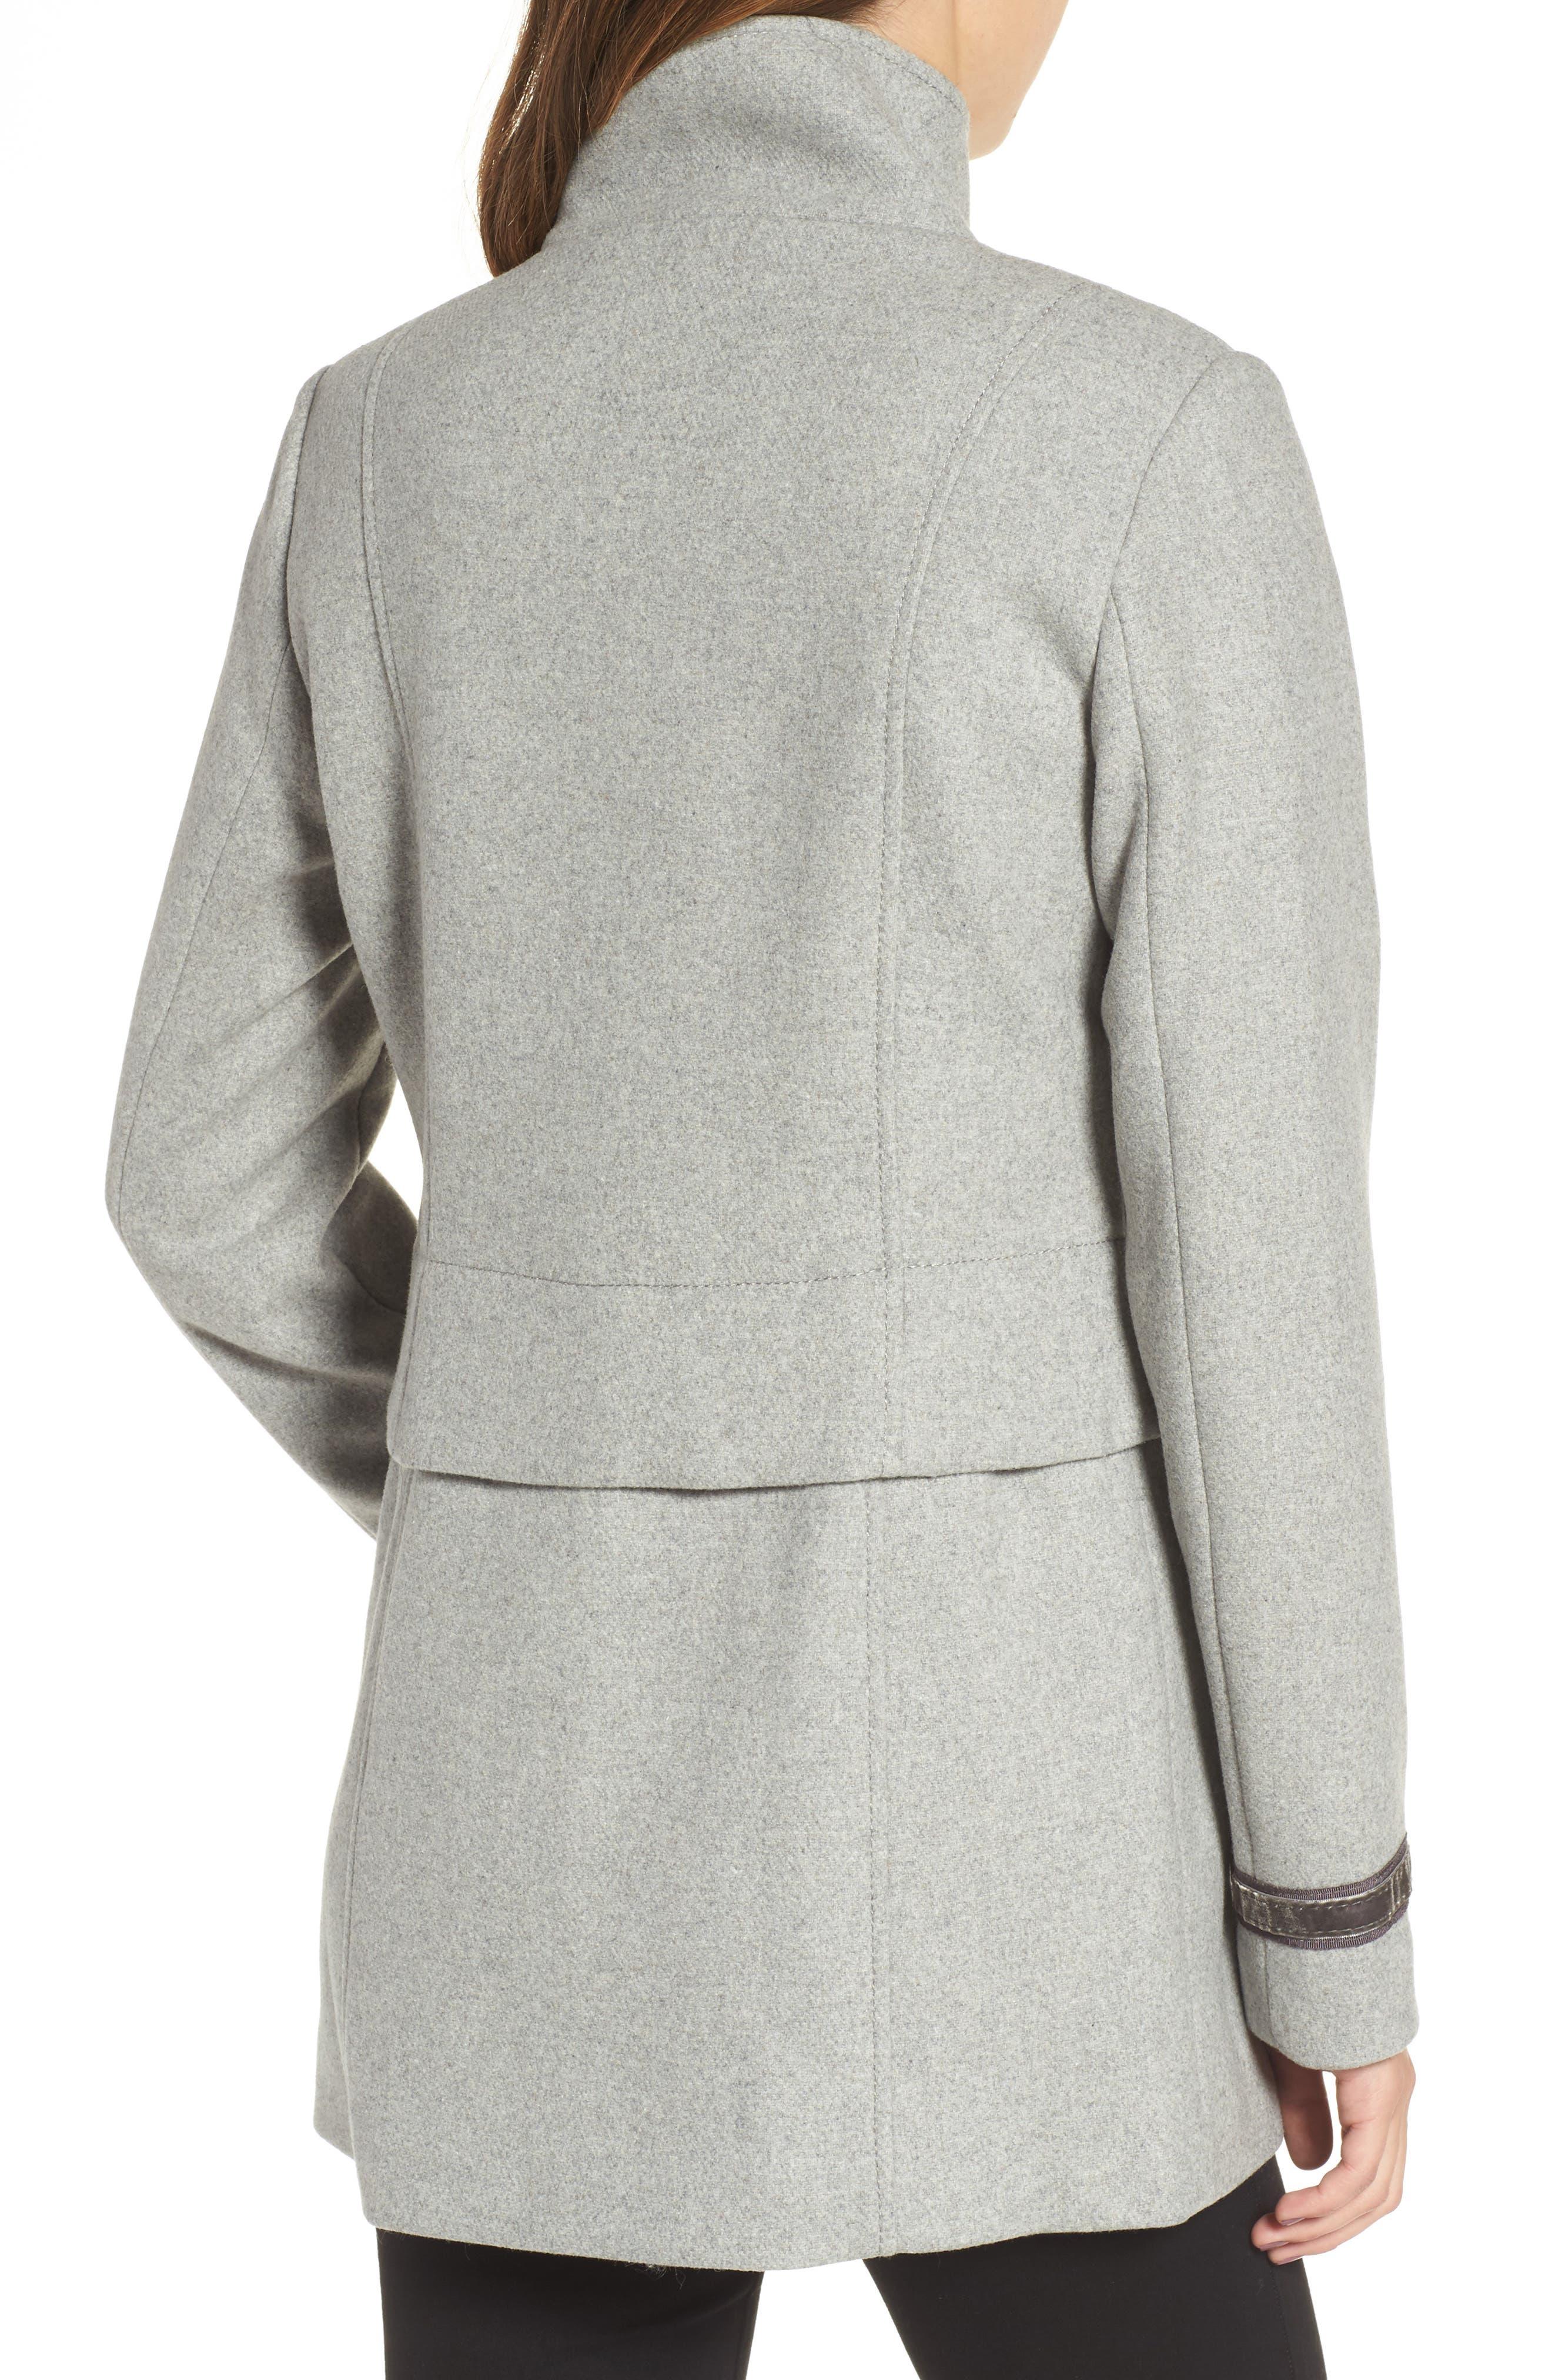 Wool Blend Military Coat,                             Alternate thumbnail 2, color,                             Light Grey